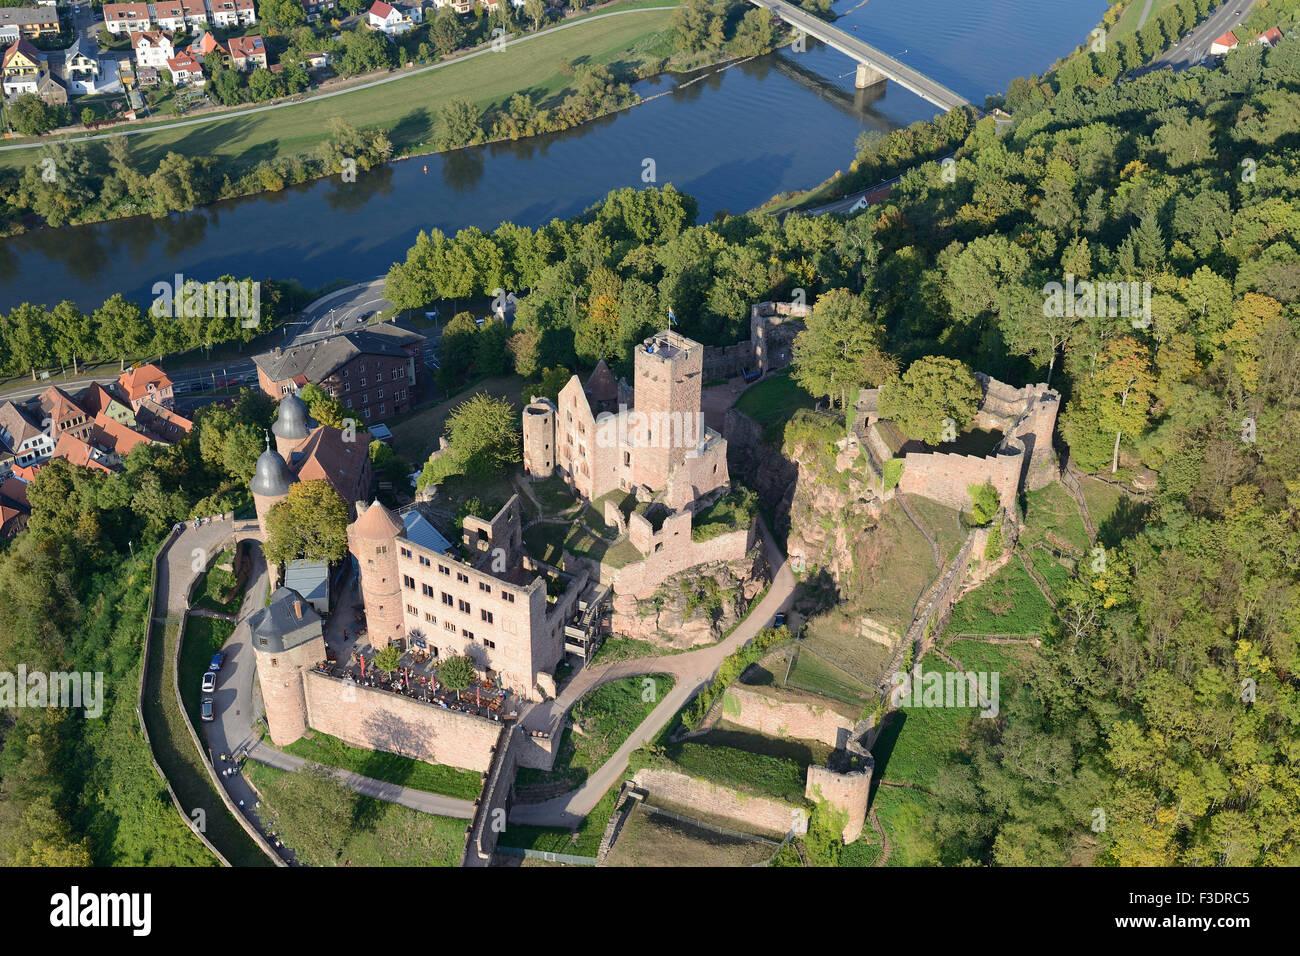 WERTHEIM CASTLE OVERLOOKING THE MAIN RIVER (aerial view). Wertheim am Main, Baden-Württemberg, Germany. - Stock Image